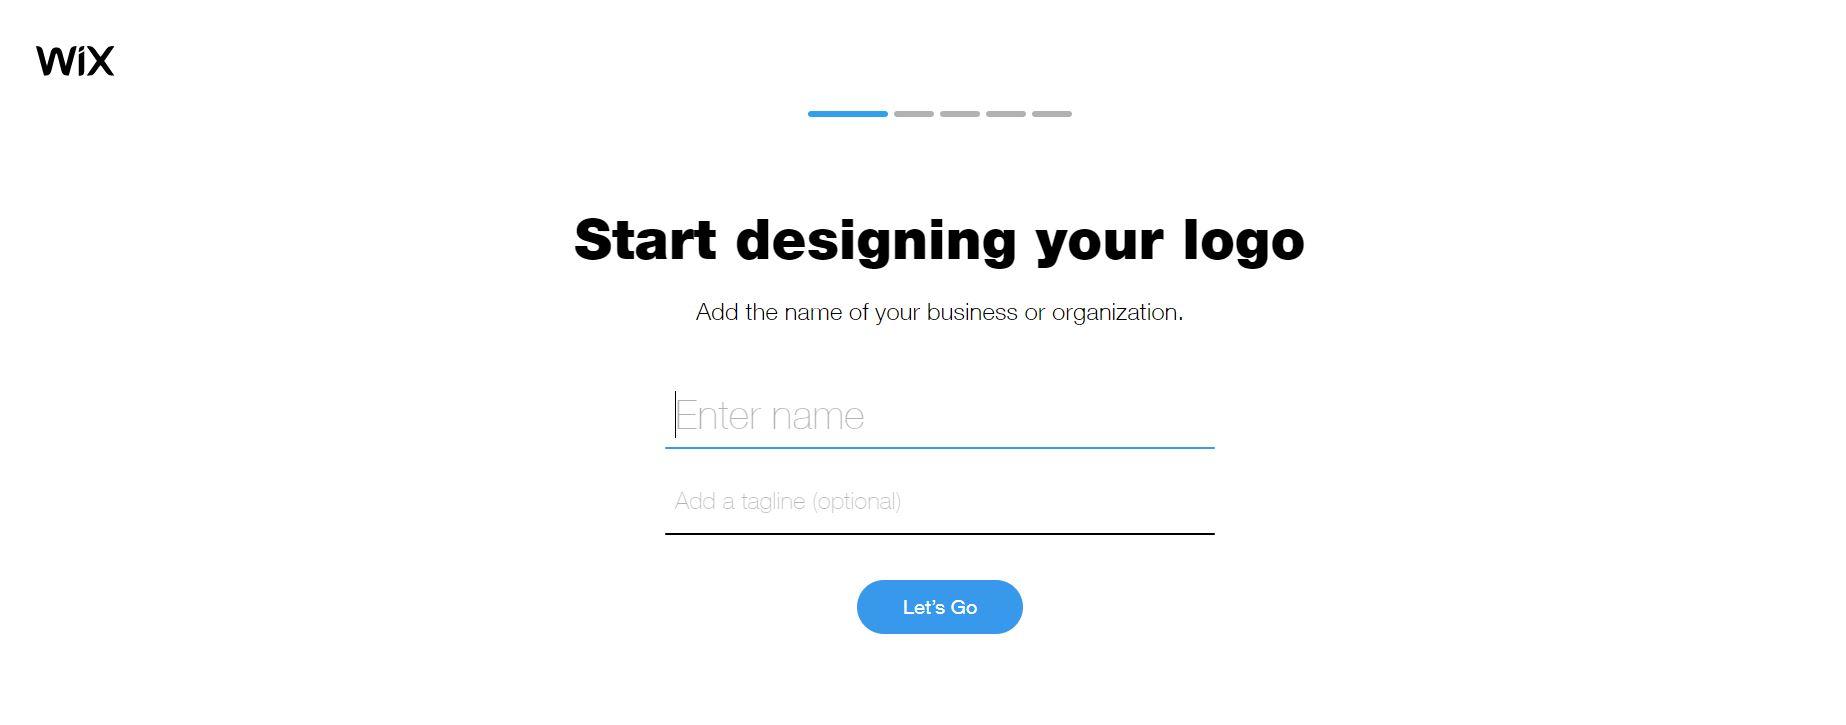 Wix Logo Maker screenshot - company details